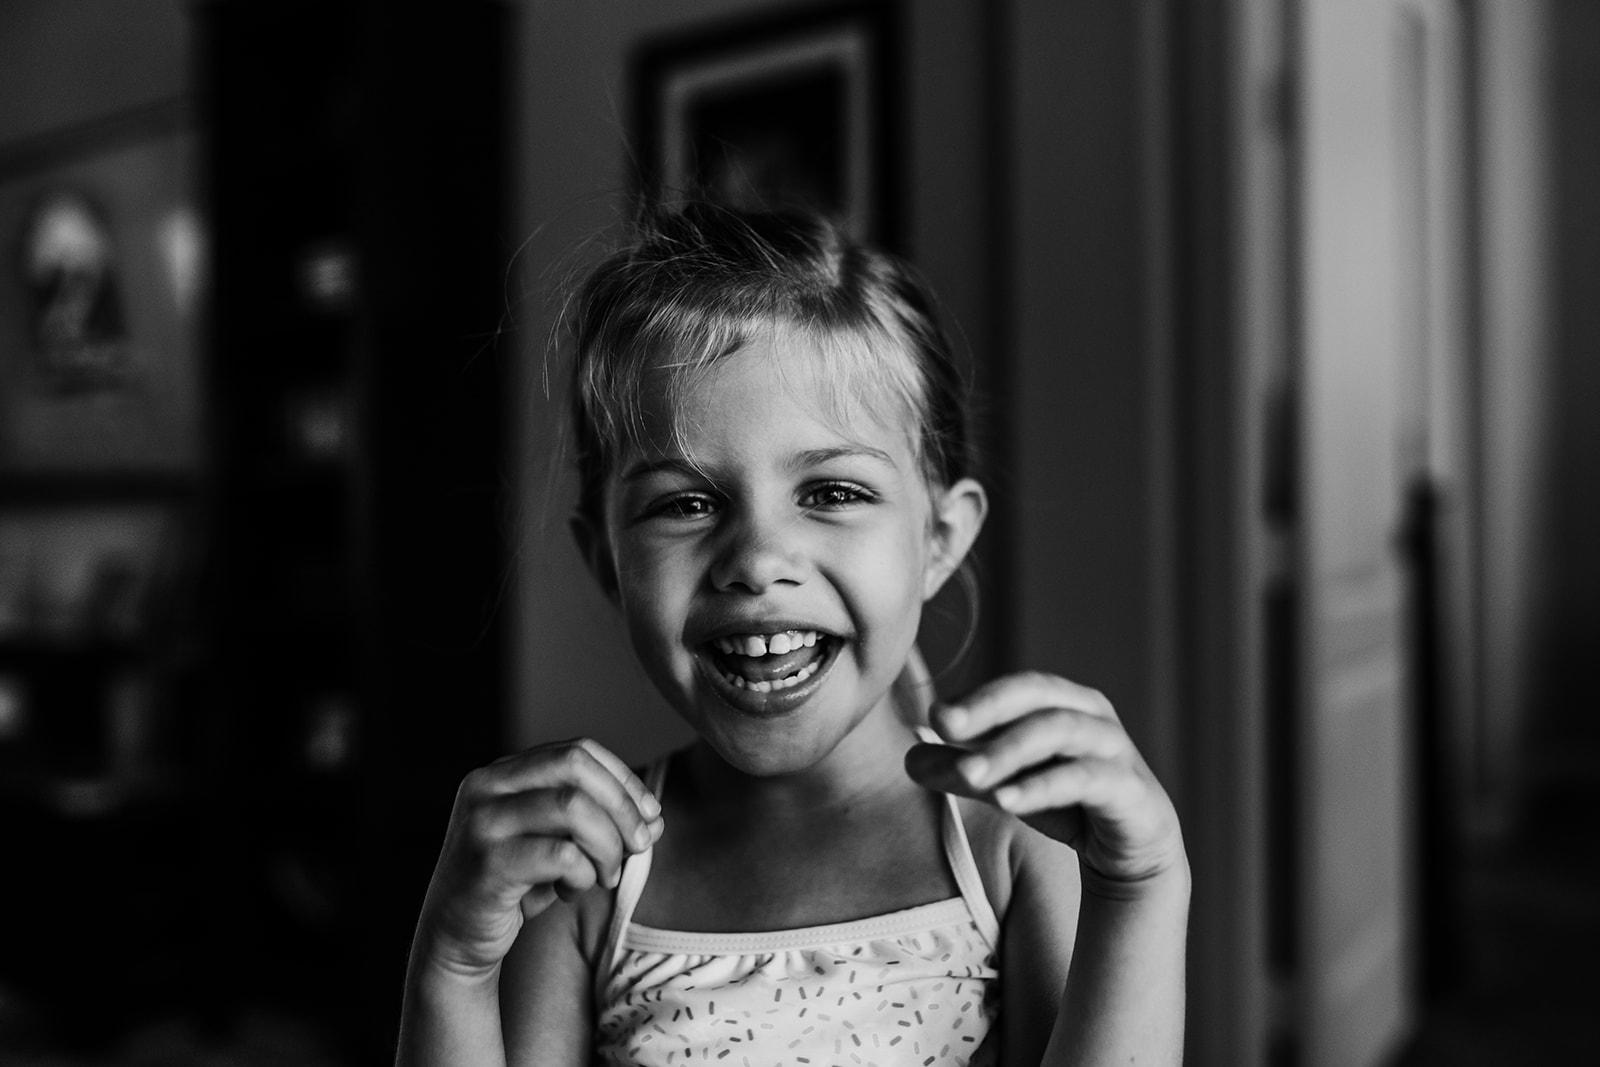 little girl smiling big